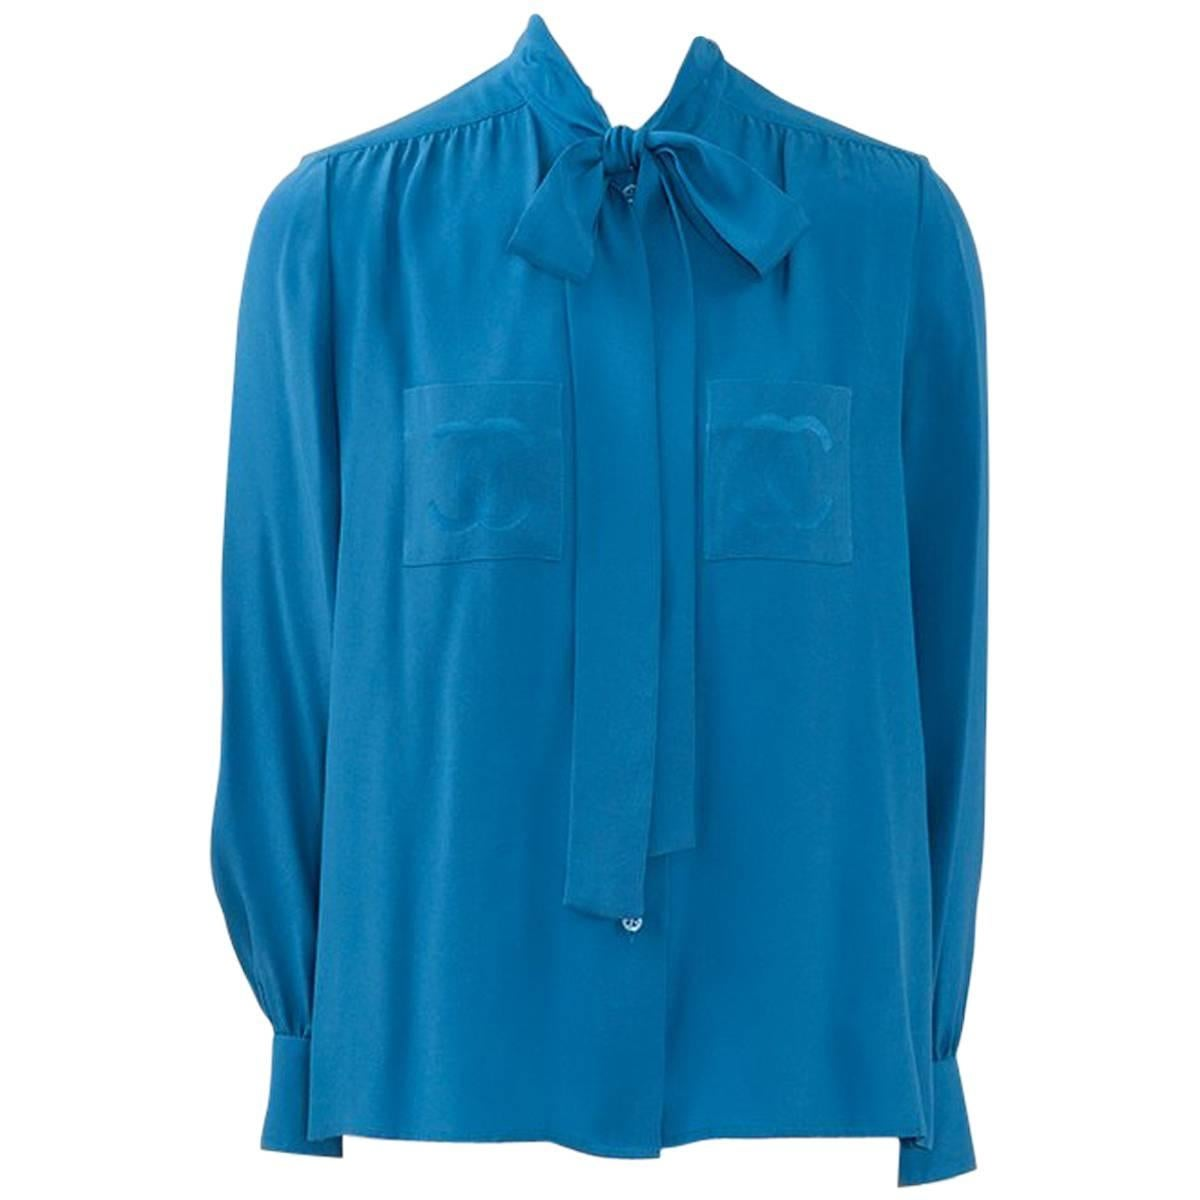 e5e1c8e0d23e89 Chanel 1980's Turquoise Silk Pussy Bow Shirt at 1stdibs